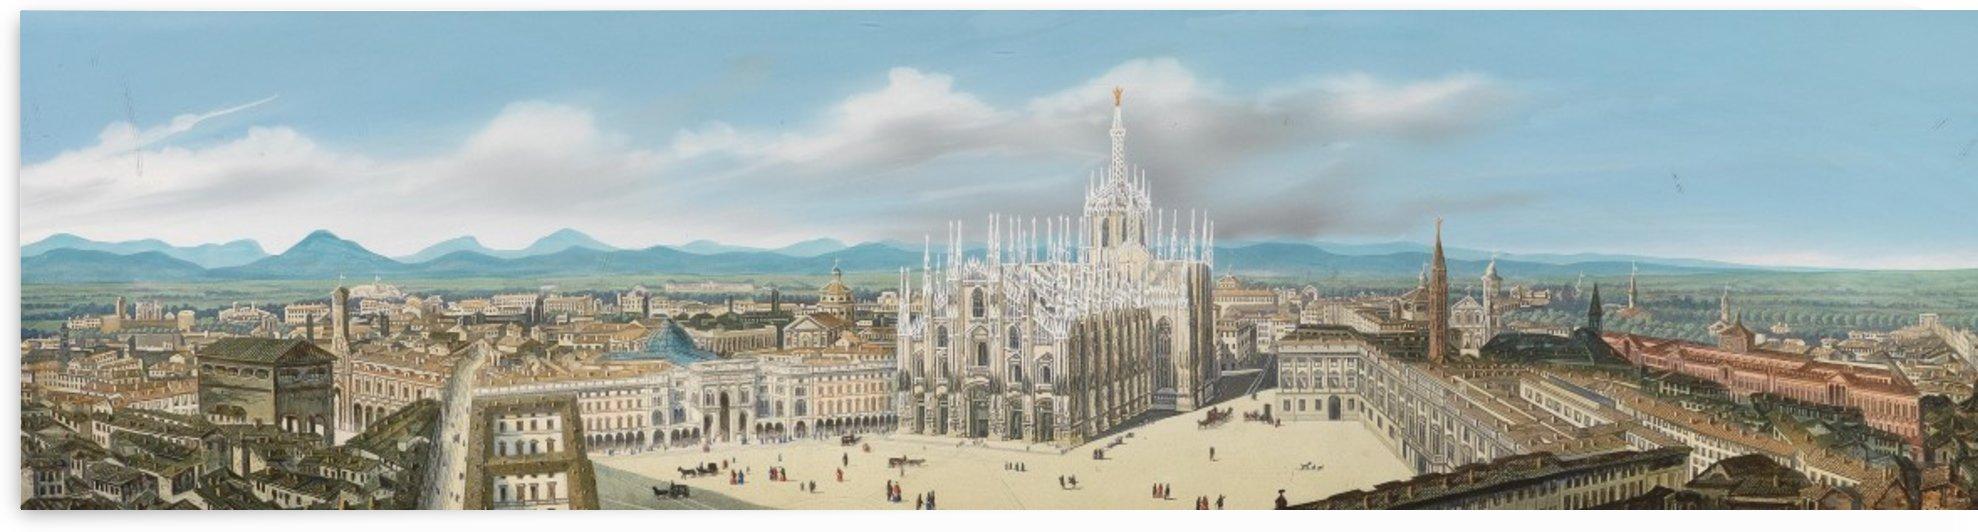 Panorama von Milano by Leopoldo Calvi